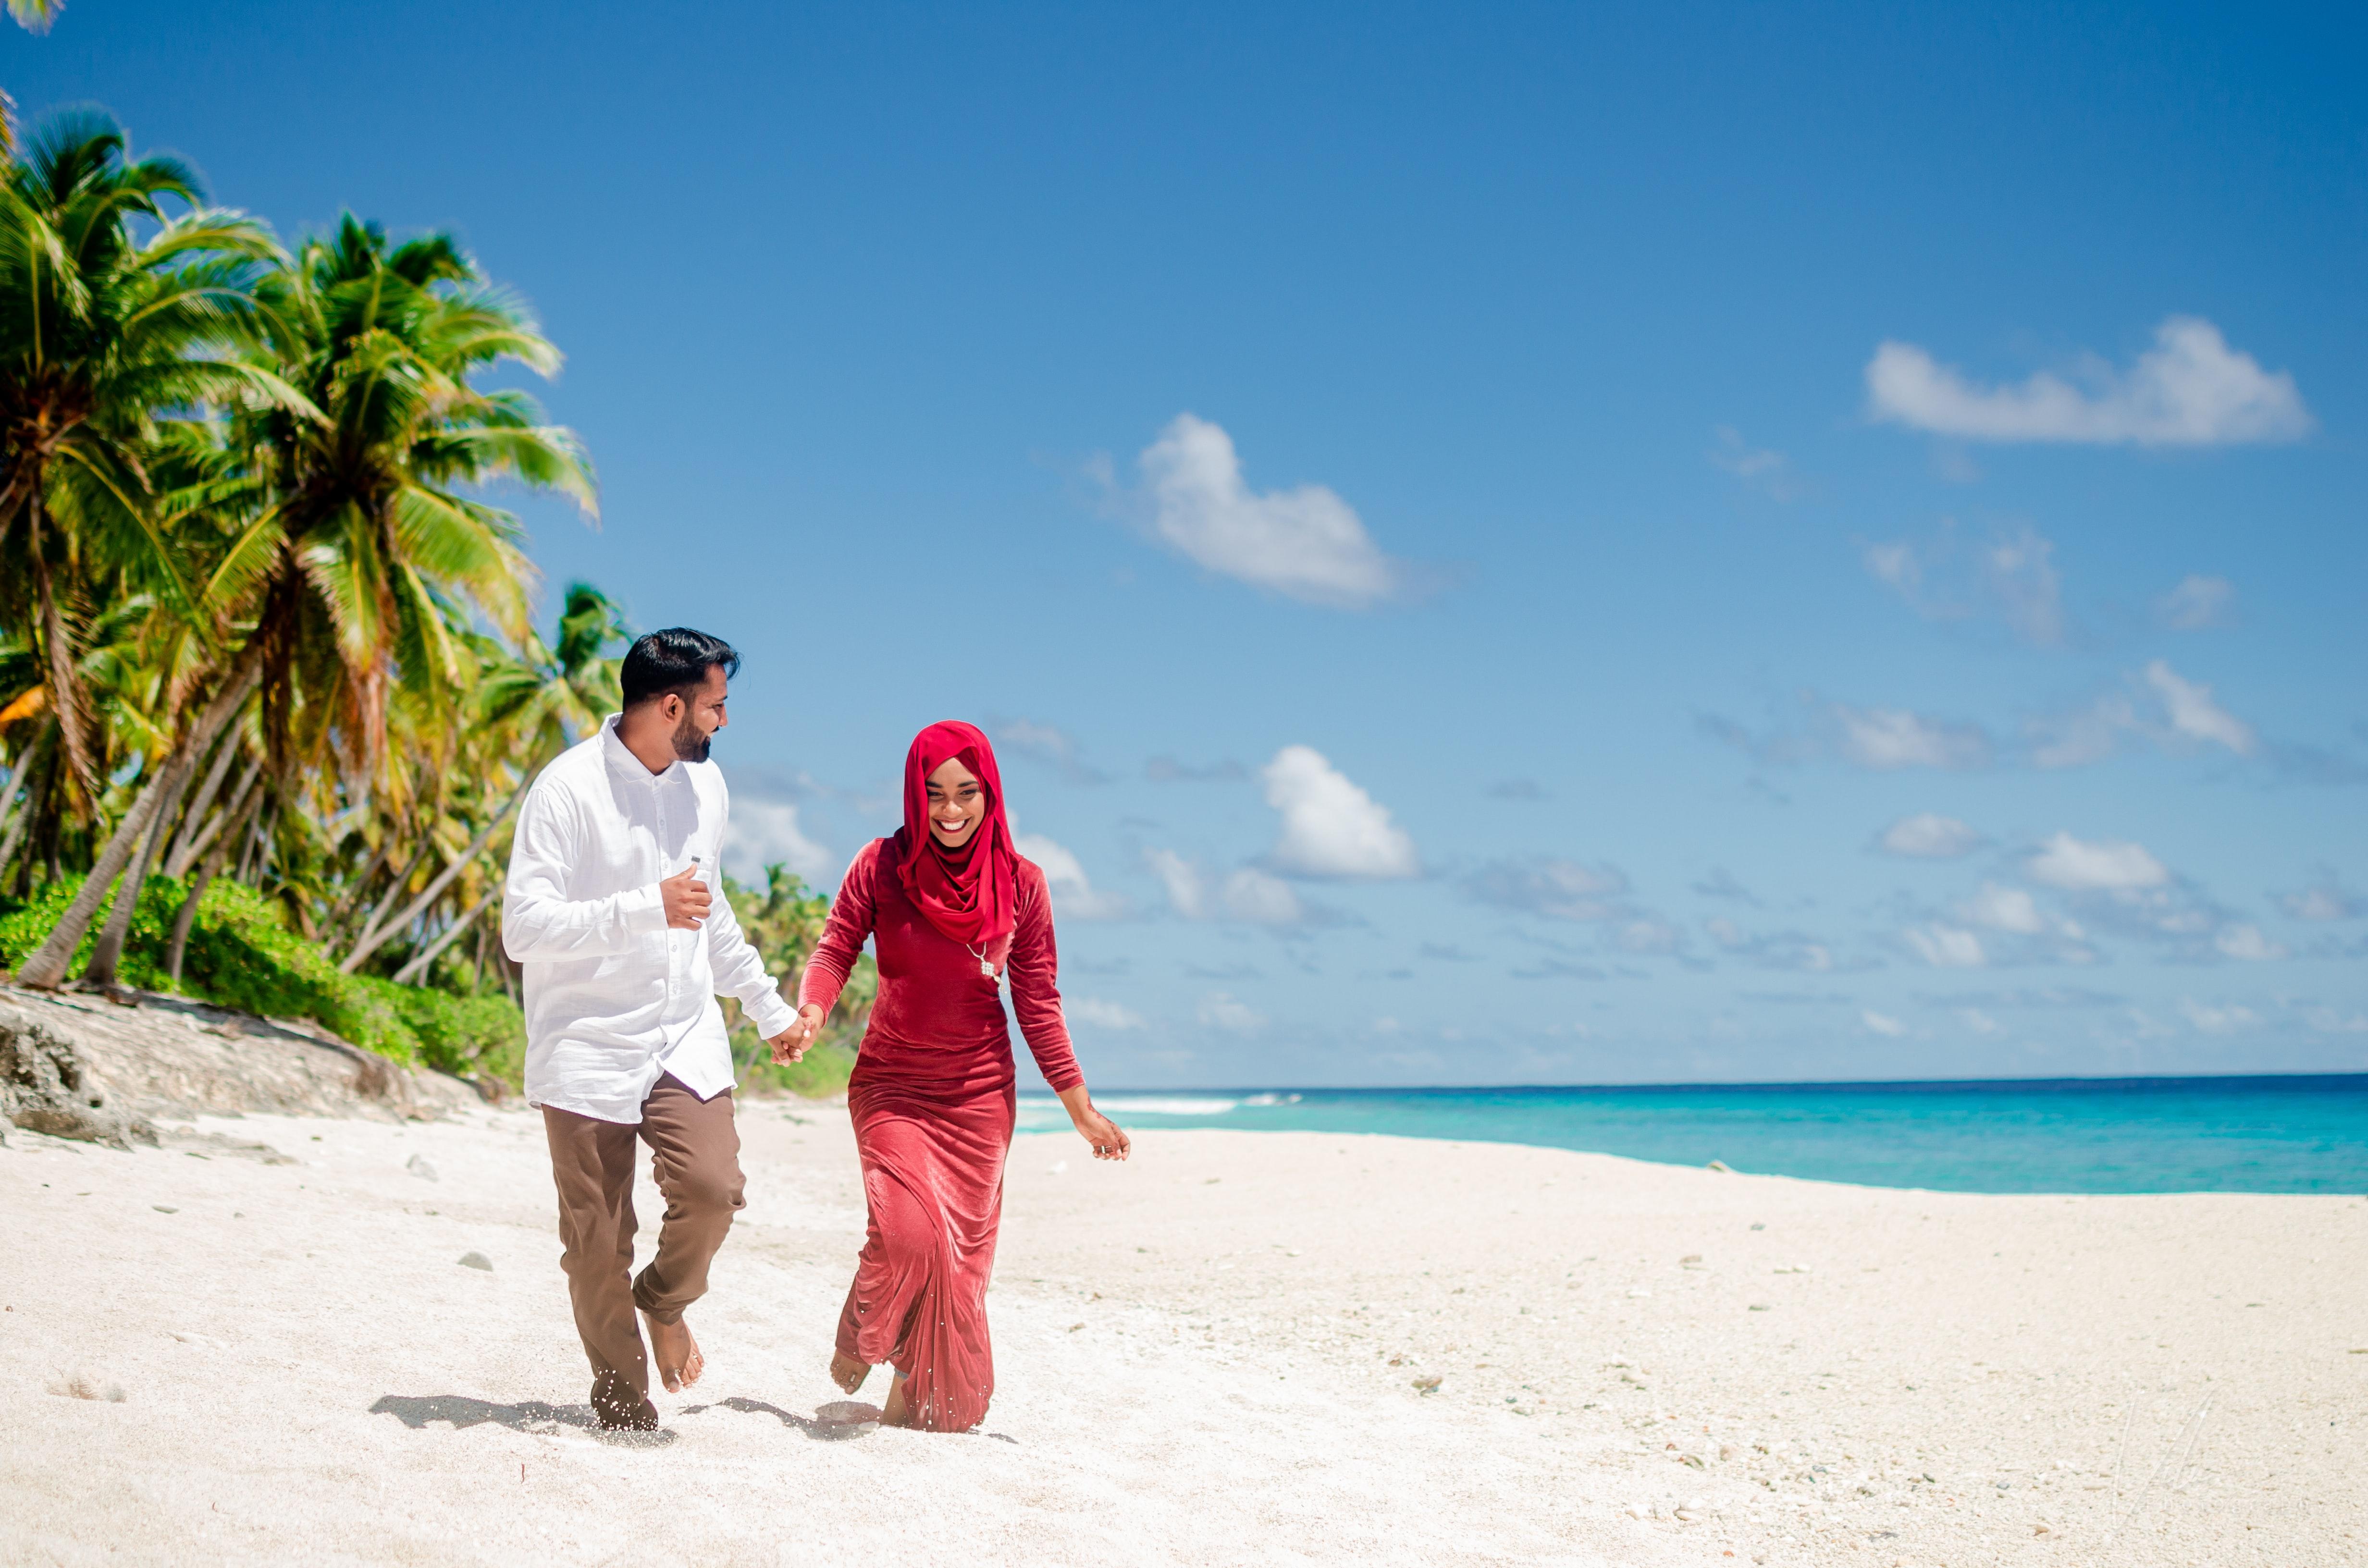 A Honeymoon couple walking along the shores of Maldives beaches